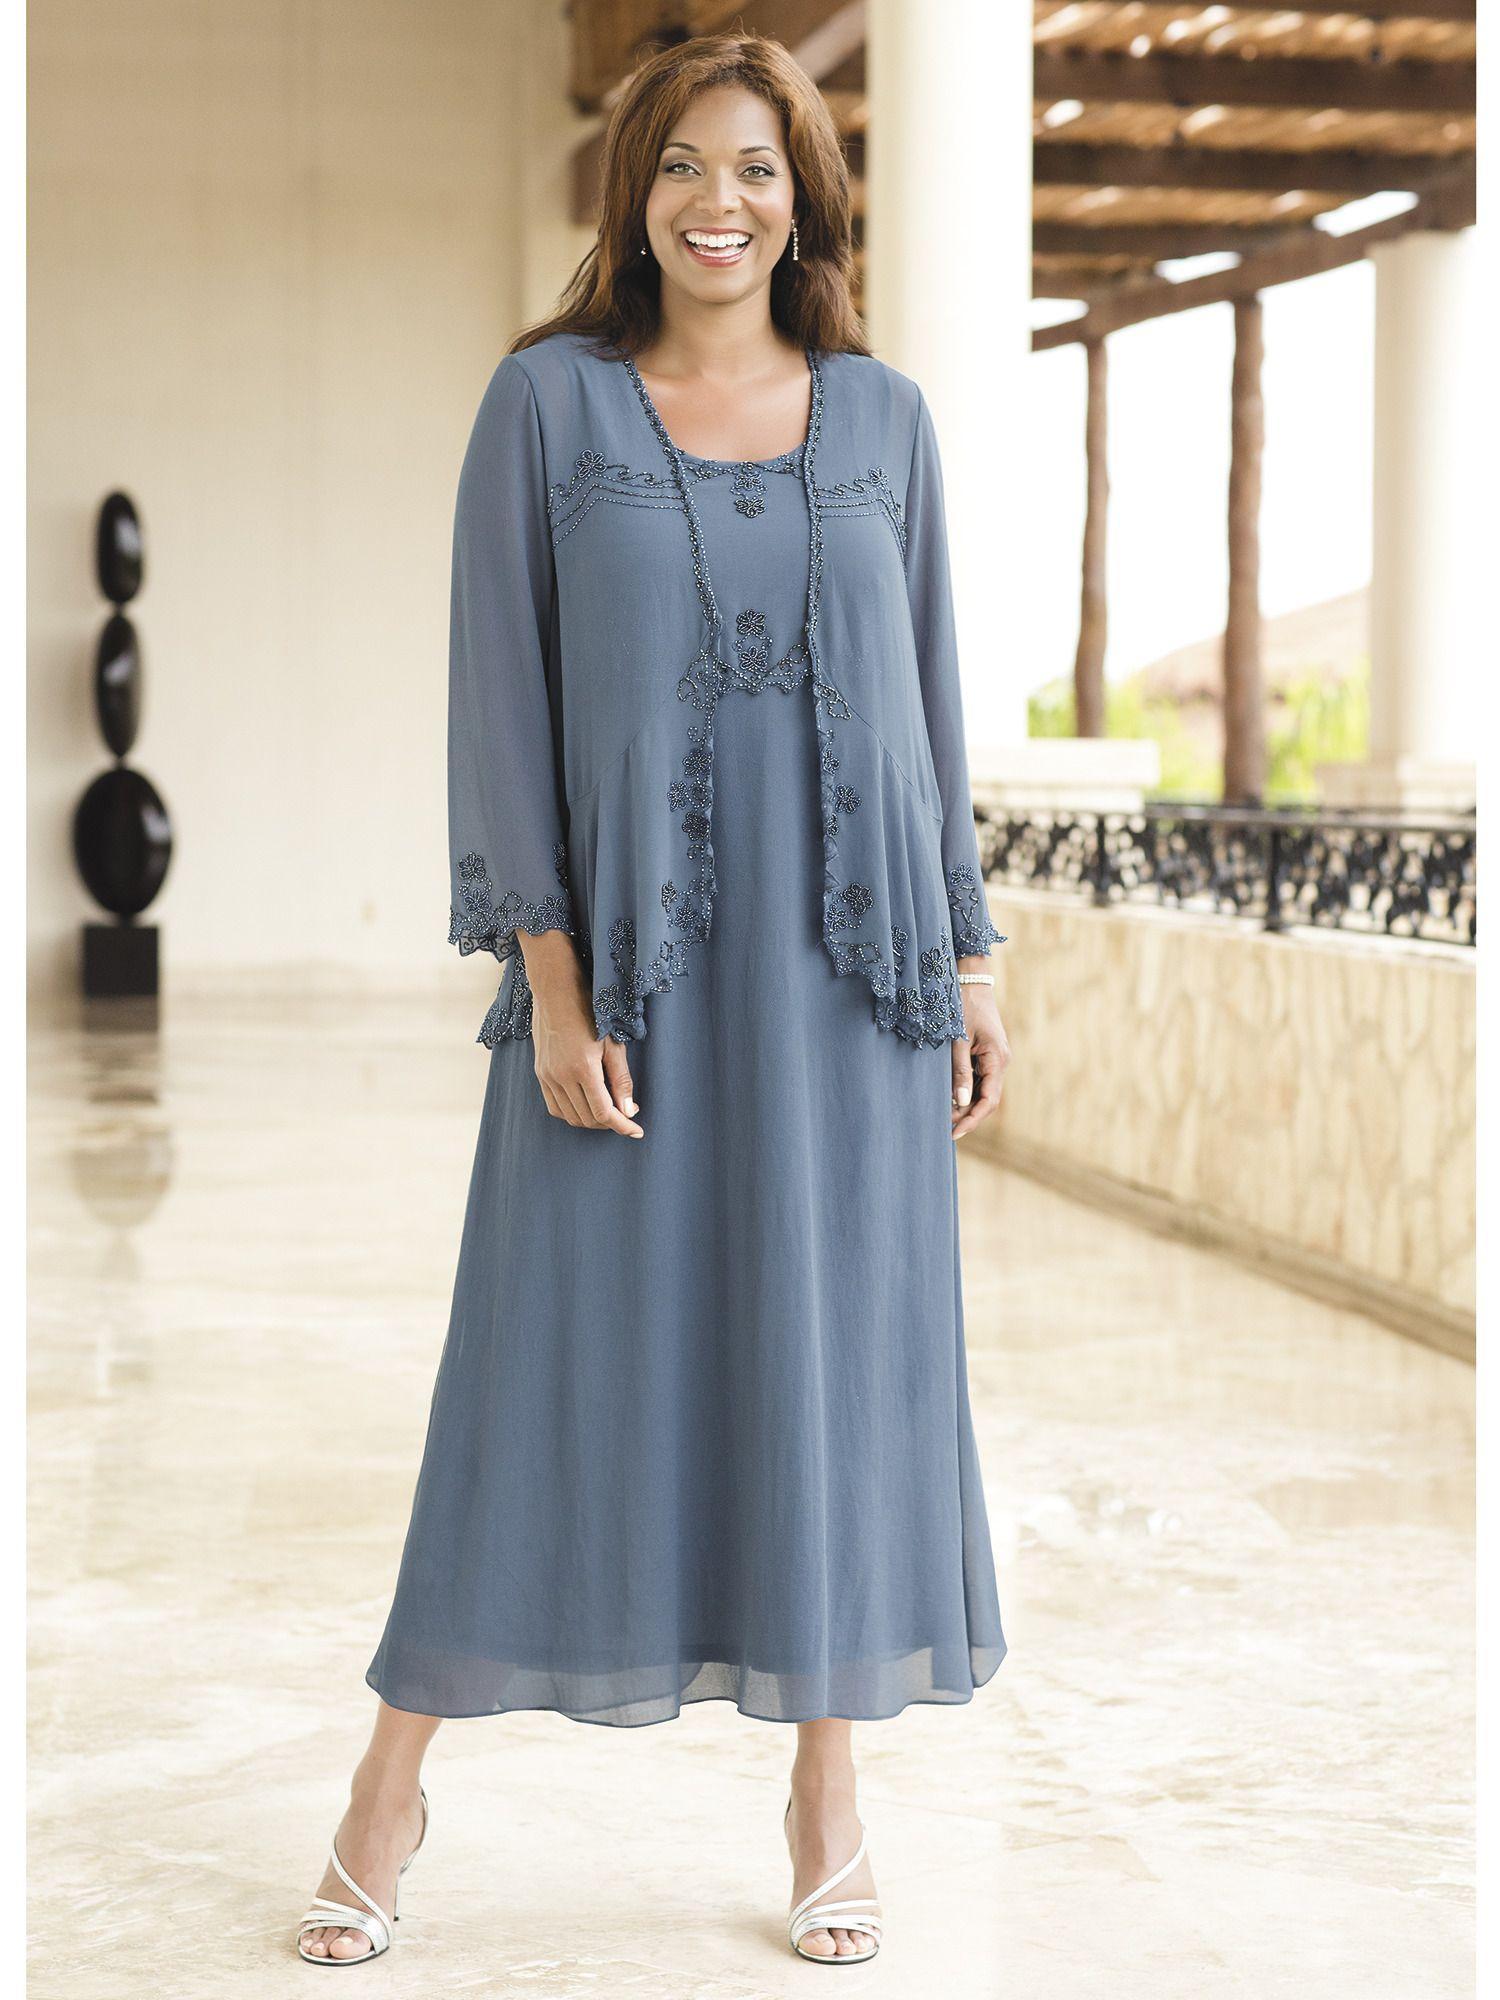 Enchanted Evenings Jacket Dress Buy Evening Dress Evening Dresses Evening Jacket Dress